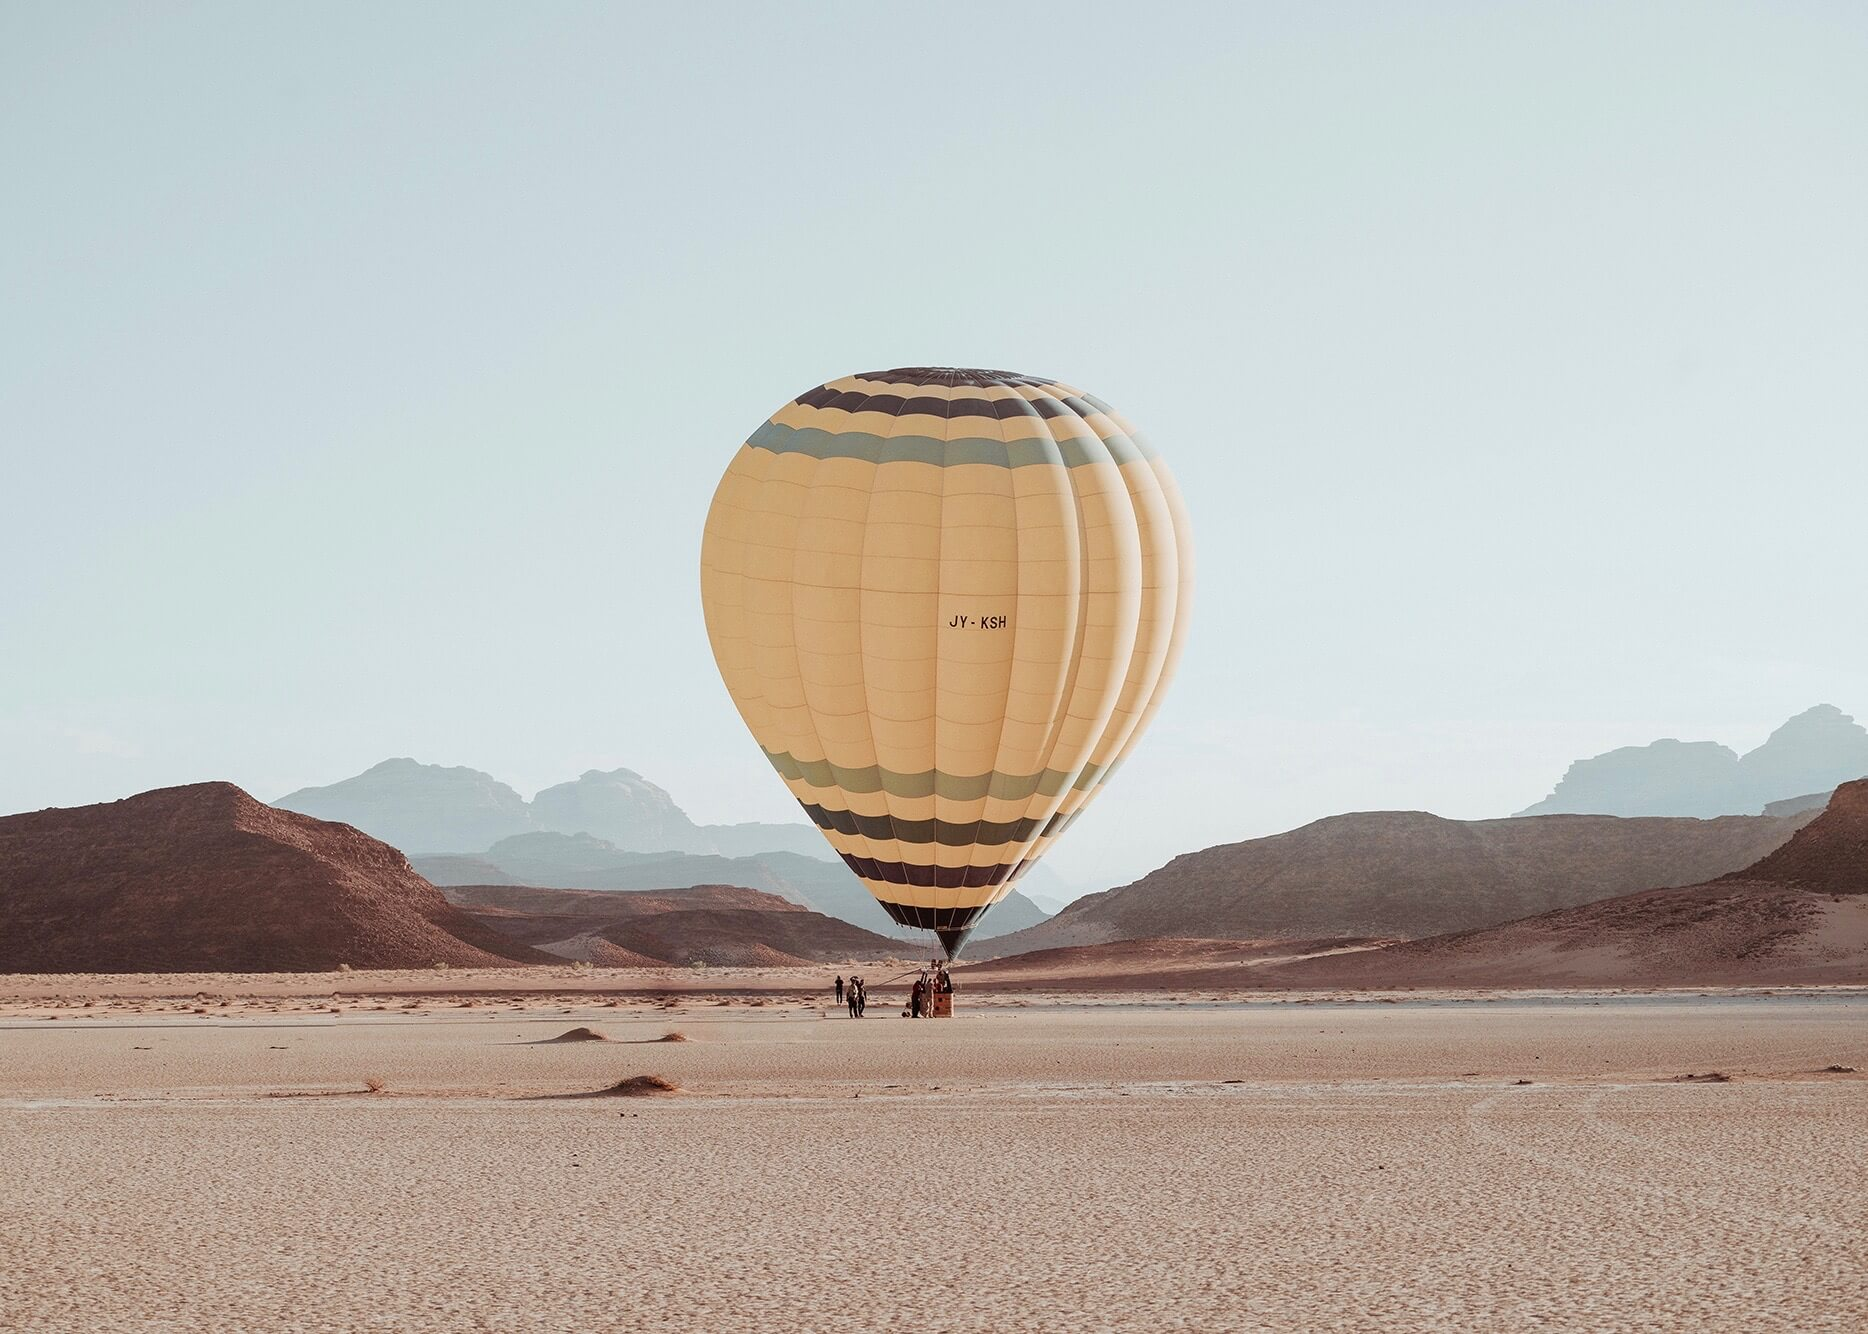 Emilie Ristevski photo of hot air balloon in the desert